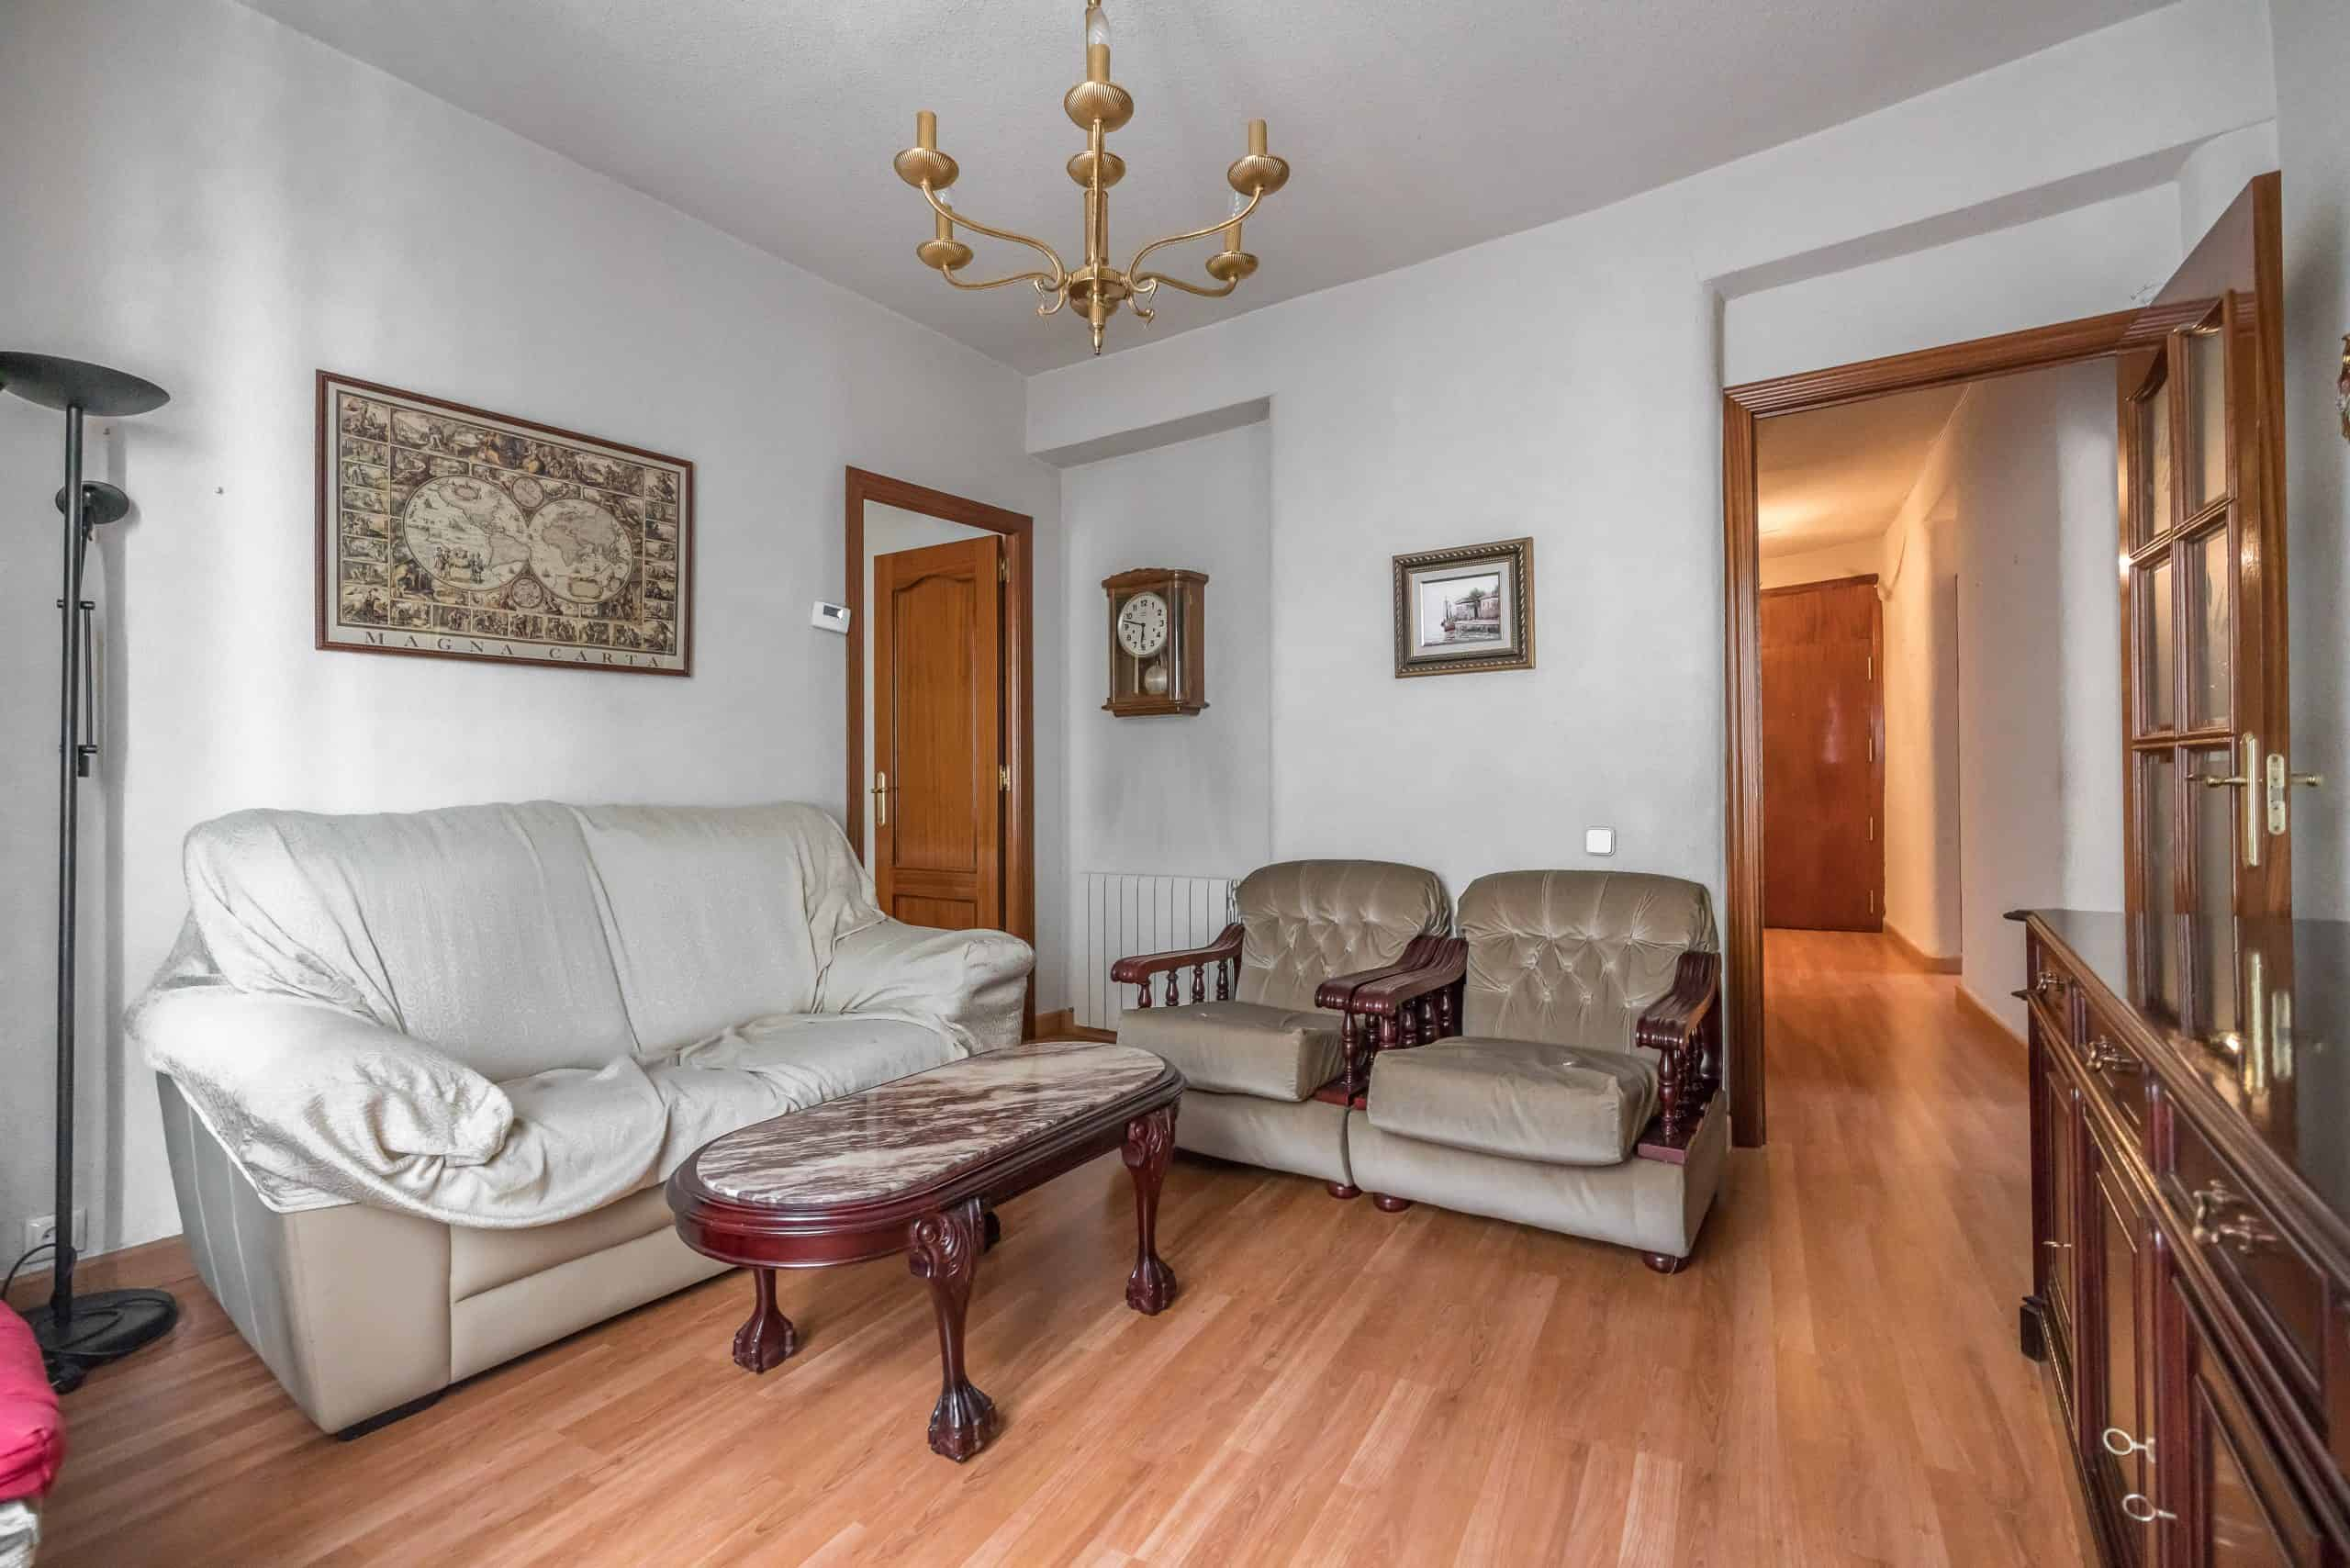 1 SALON (9) (Copy) Agencia Inmobiliaria de Madrid-FUTUROCASA-Zona ARGANZUELA-